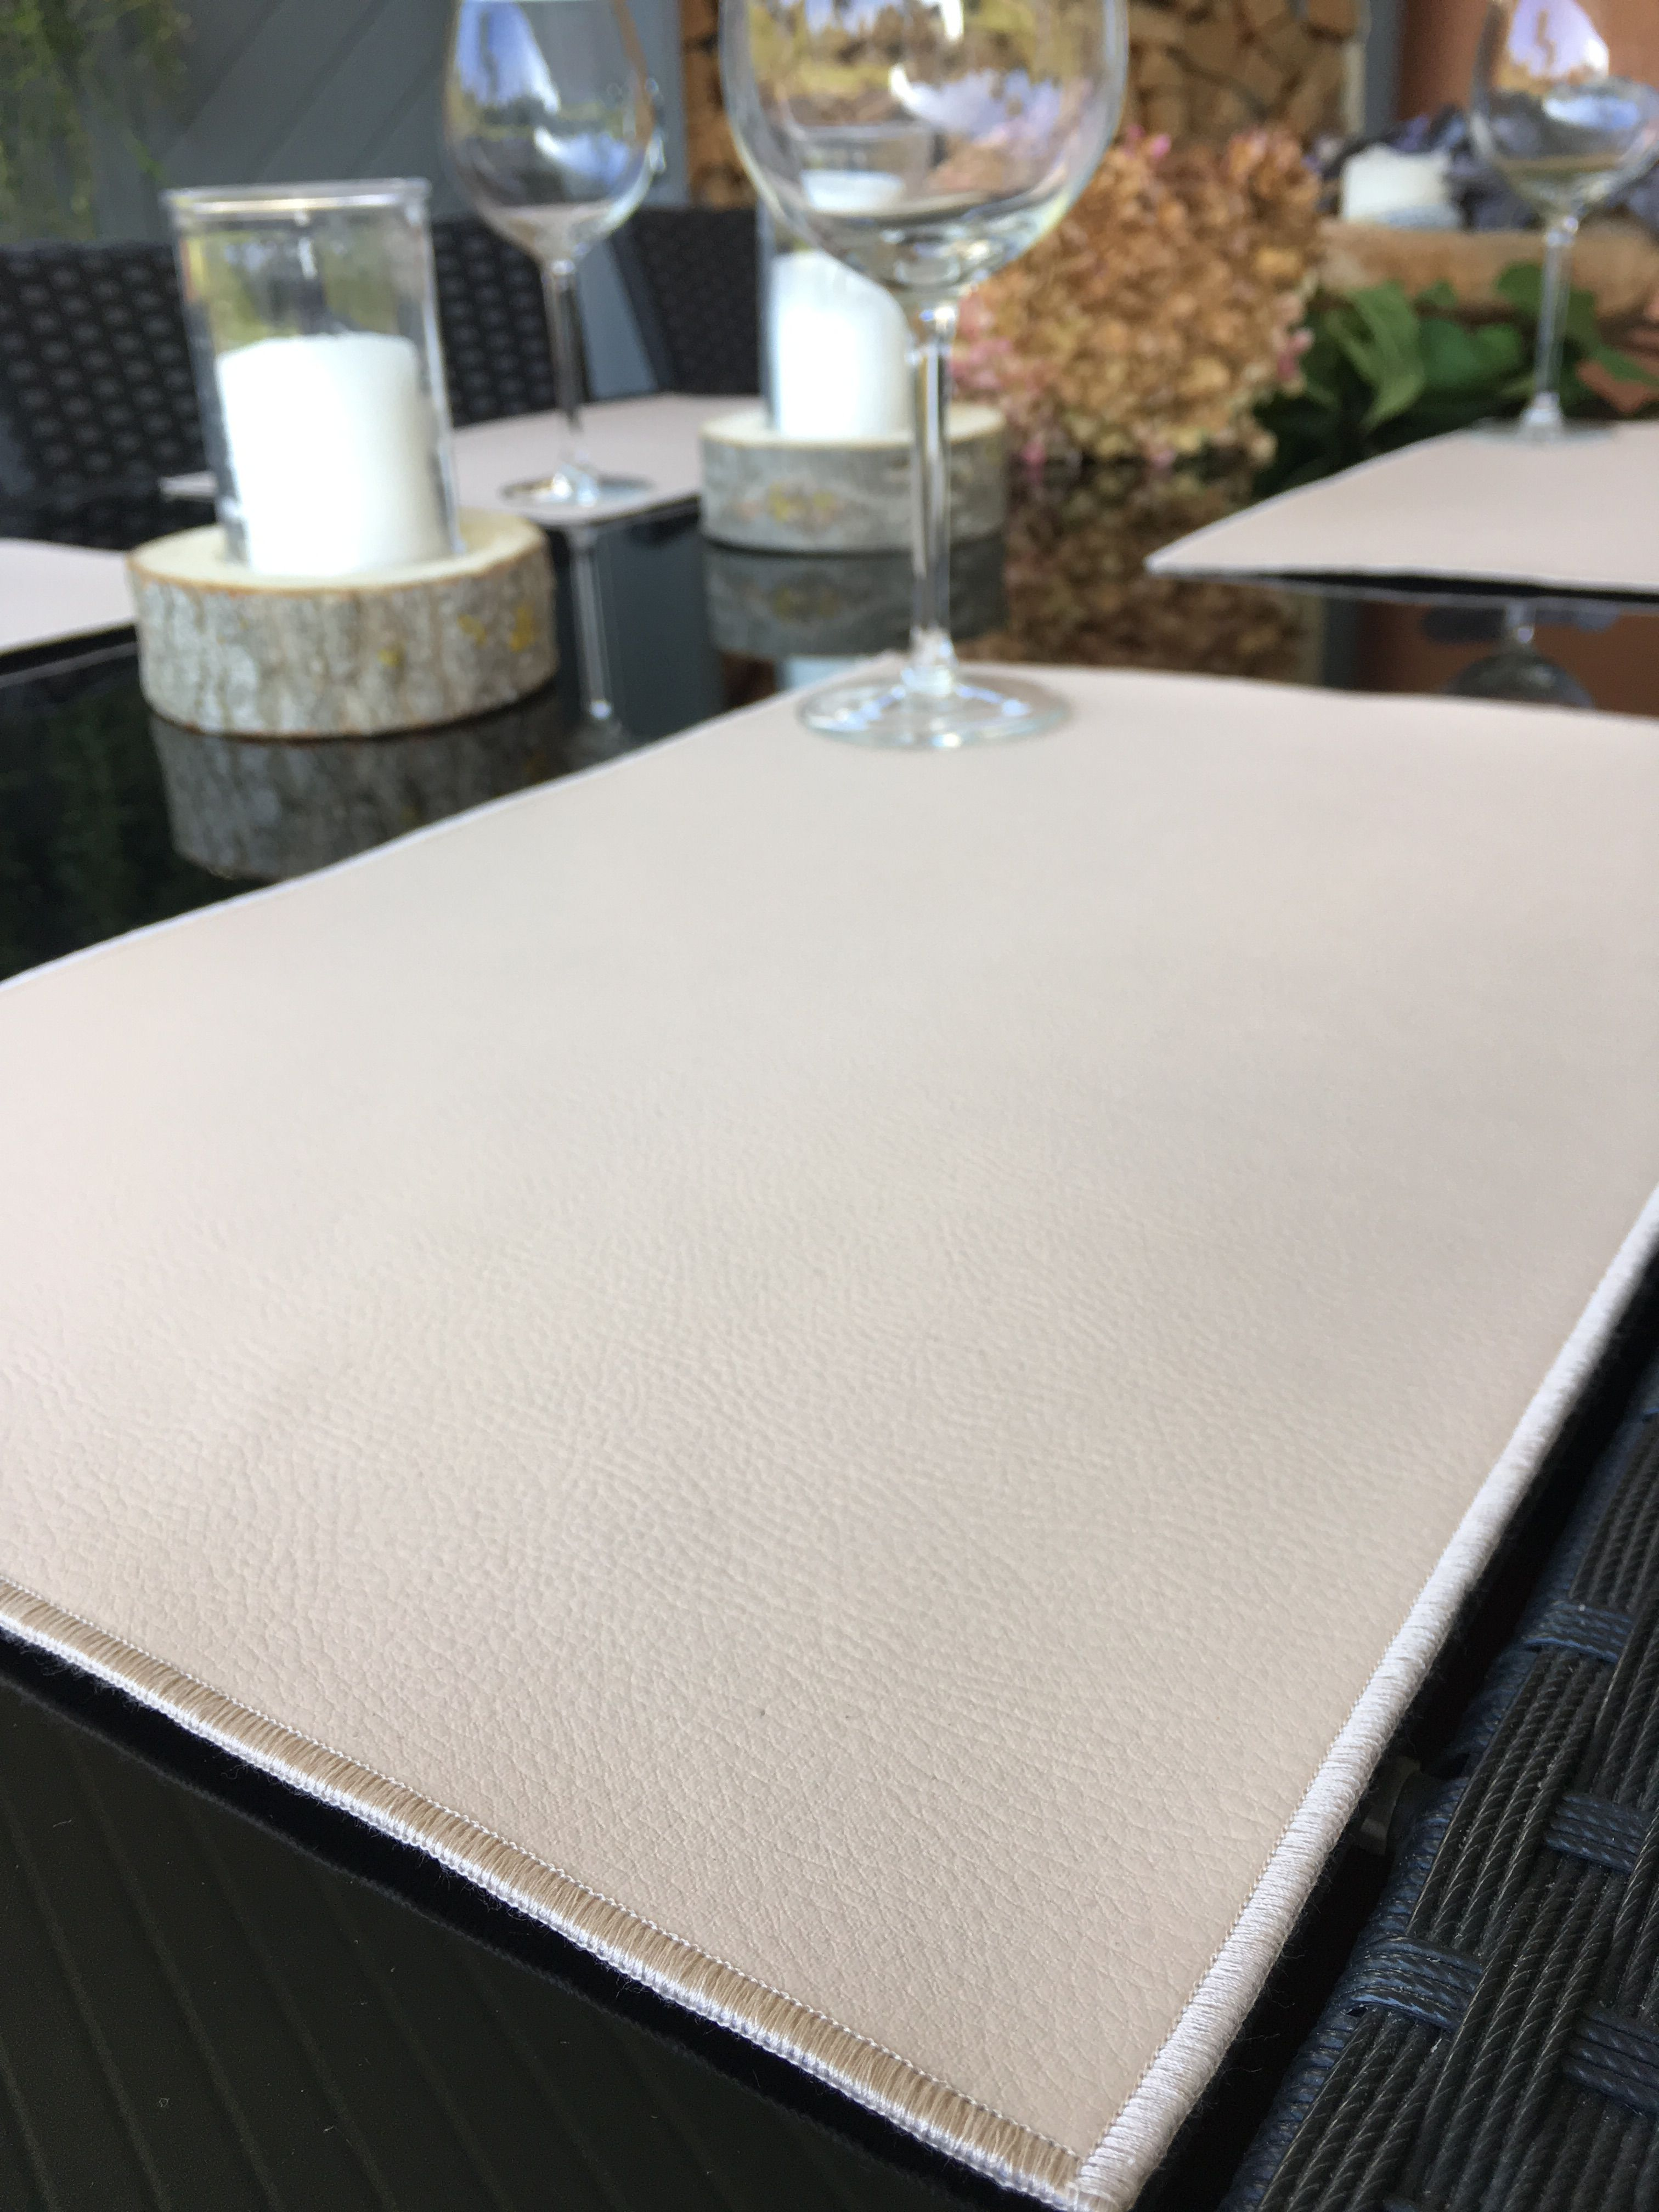 Wundervolles Platzset In Der Farbe Altrosa Rose Style Handmade Home Homedecor Platzset Tischset Home Decor